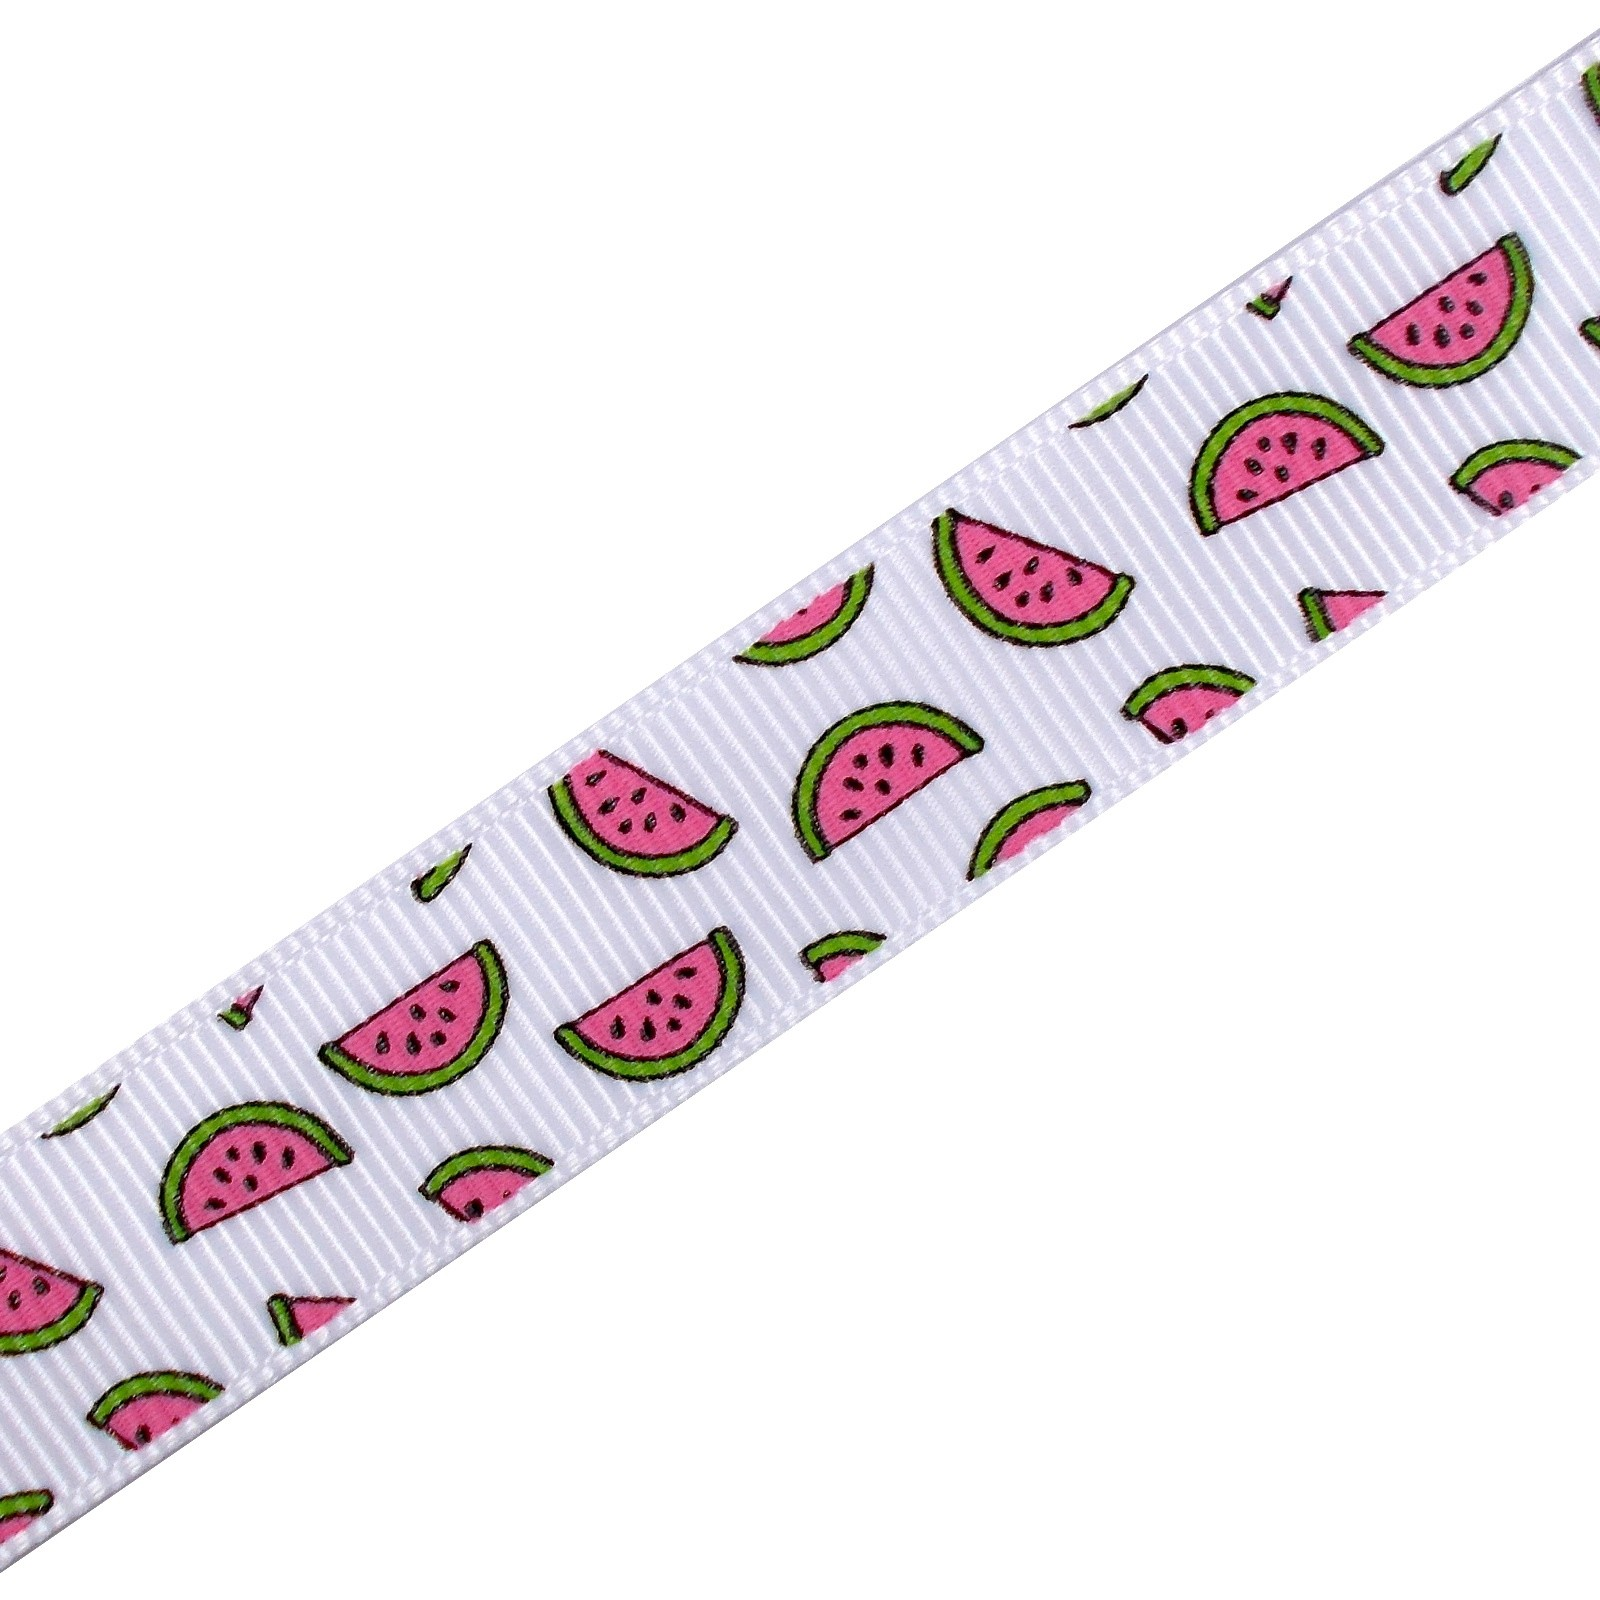 Tropical Print Grosgrain Ribbon 16mm Wide Watermelon 3 metre length